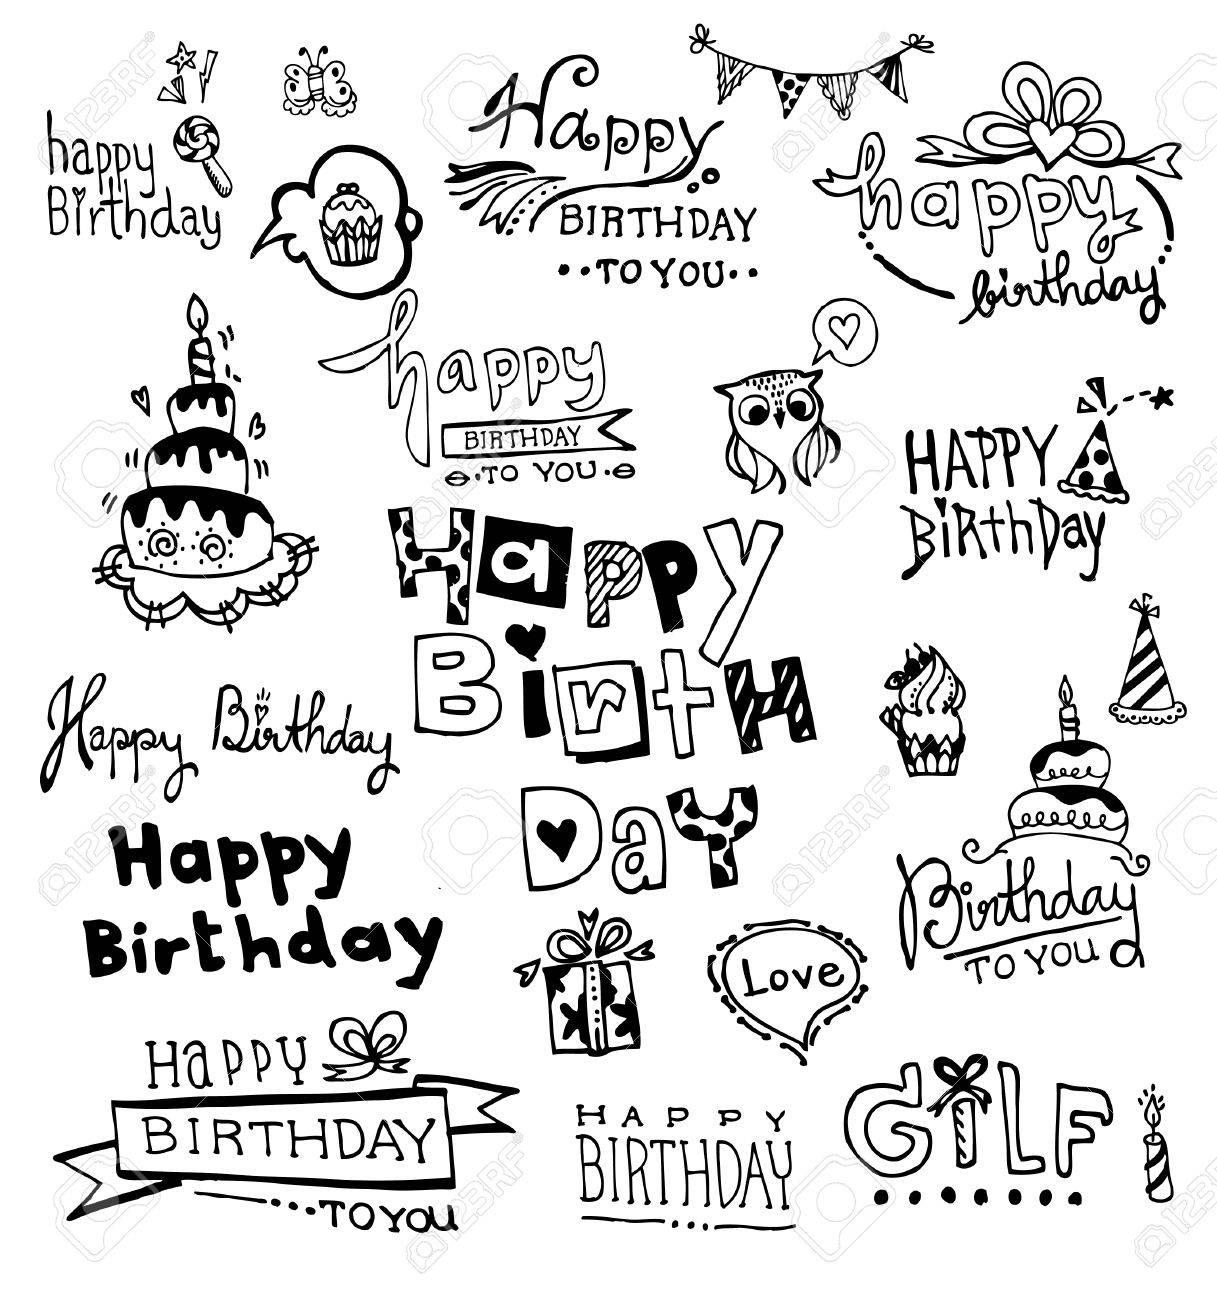 Doodle Happy Birthday, vector illustrations - 38098647